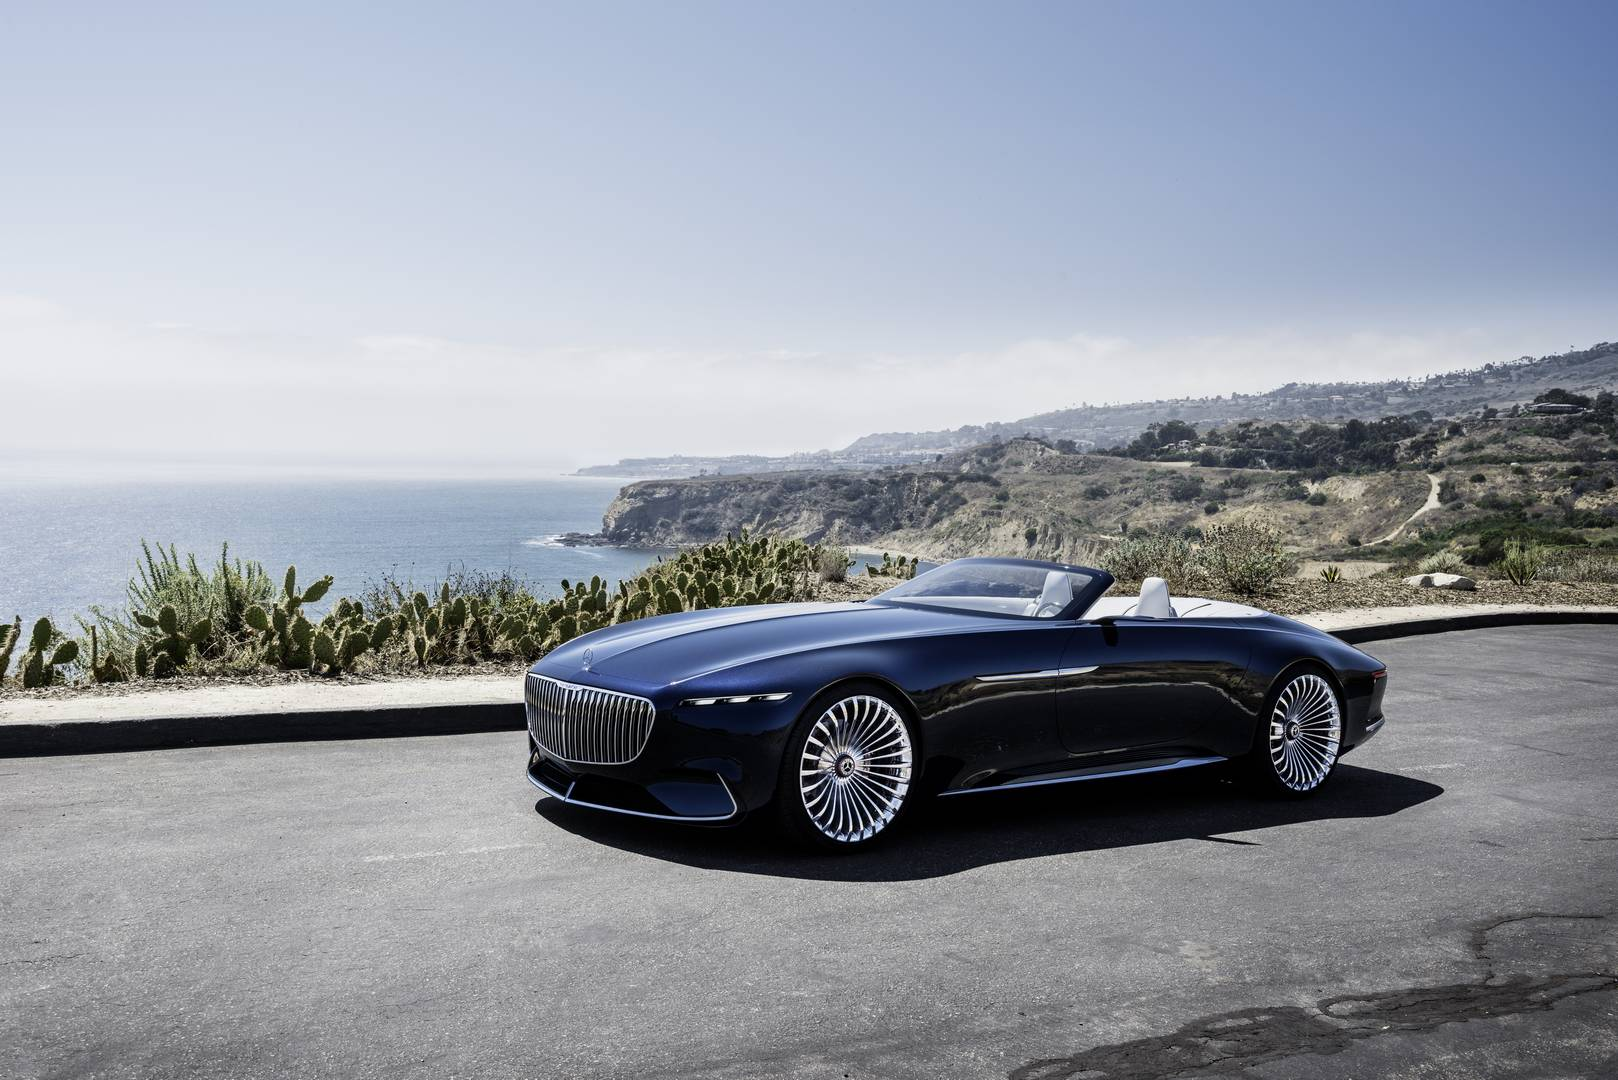 official vision mercedes maybach 6 cabriolet gtspirit. Black Bedroom Furniture Sets. Home Design Ideas